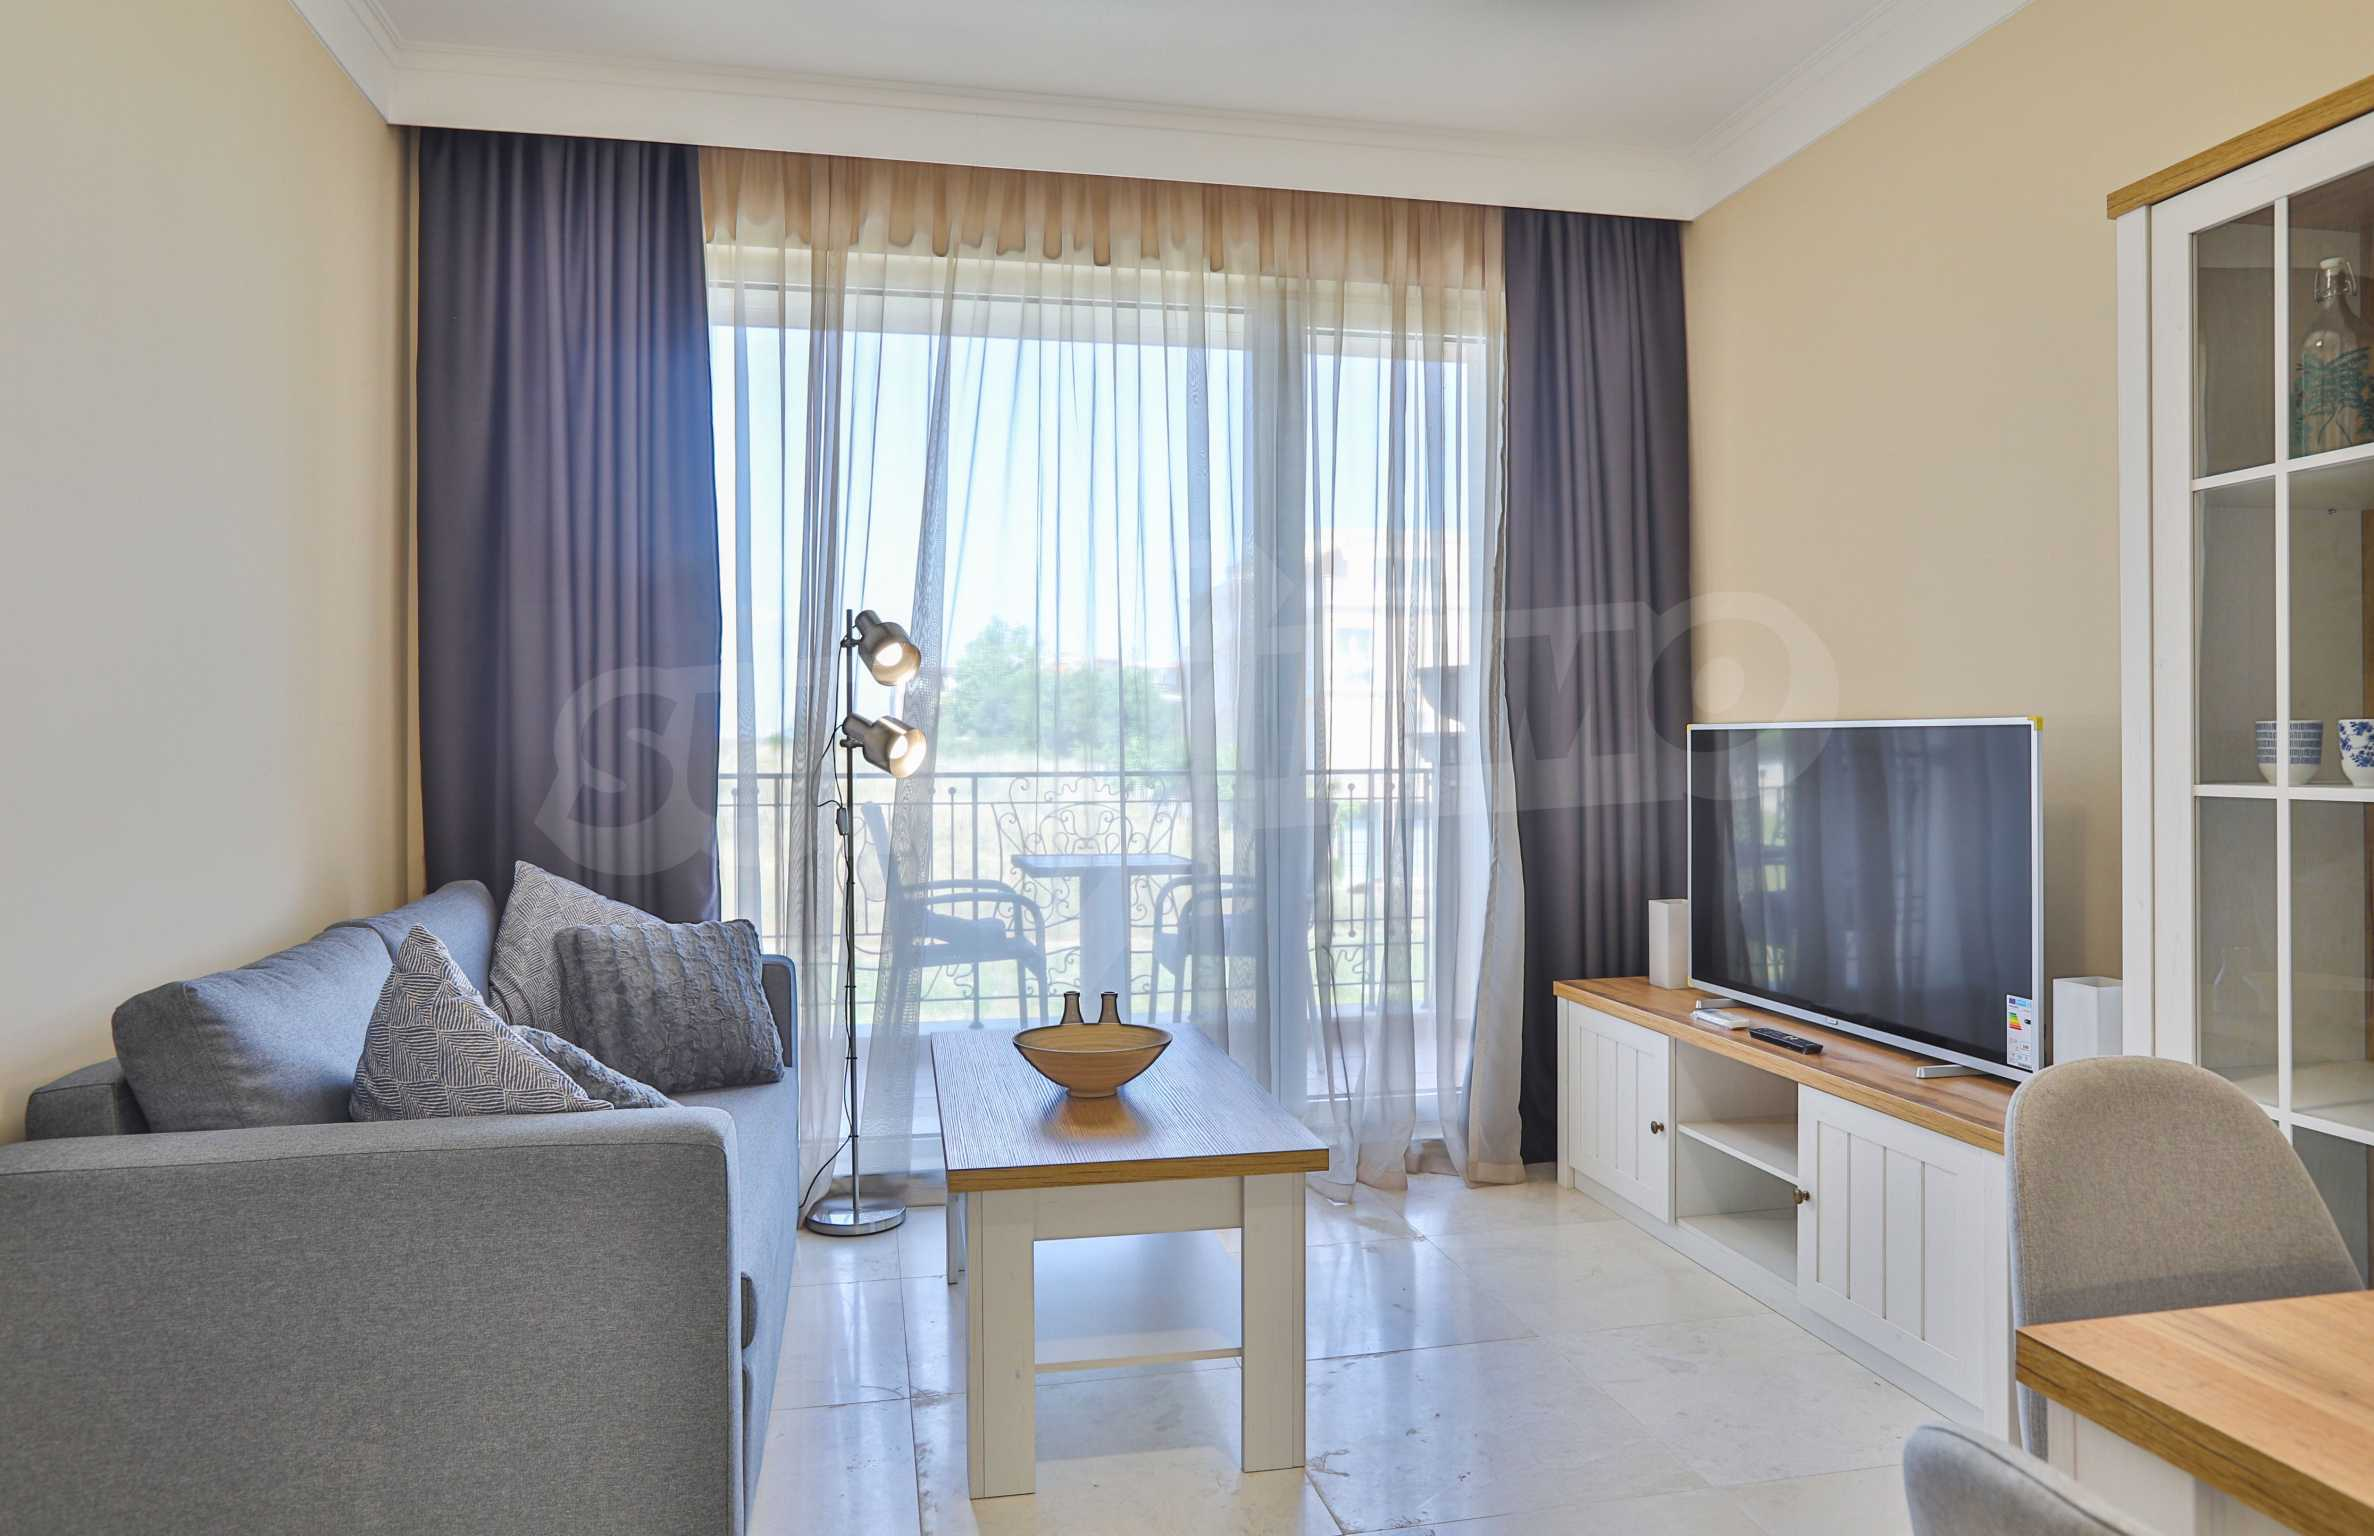 Първокласен двустаен апартамент в Belle Époque Beach Residence (ап. №A 206) 1